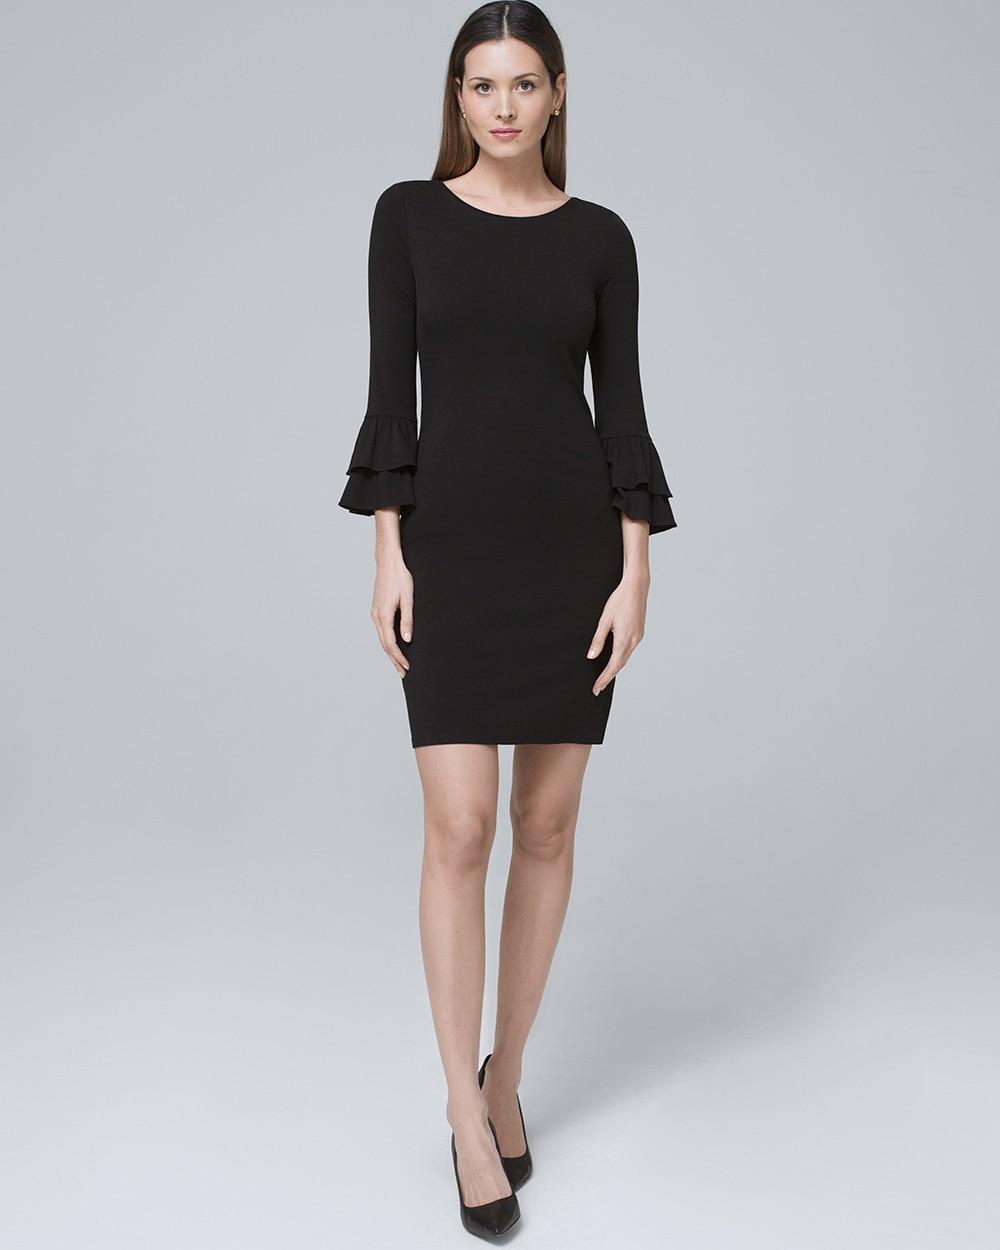 Tiered-Sleeve Black Knit Shift Dress